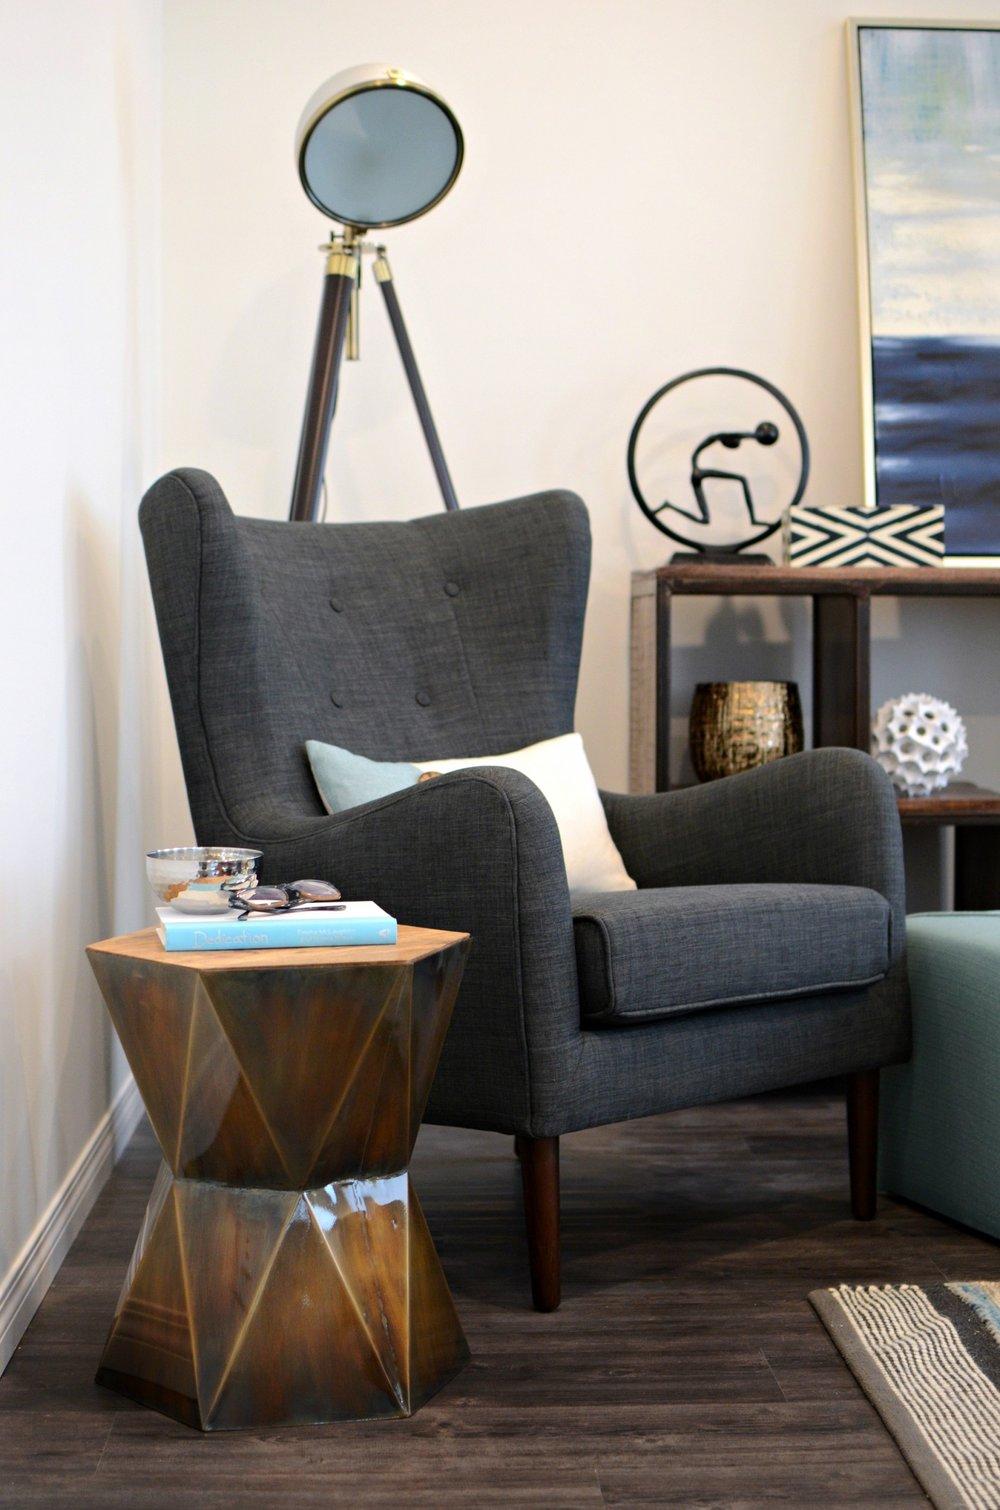 calgary-interior-designer-family-room-furniture-8.jpg